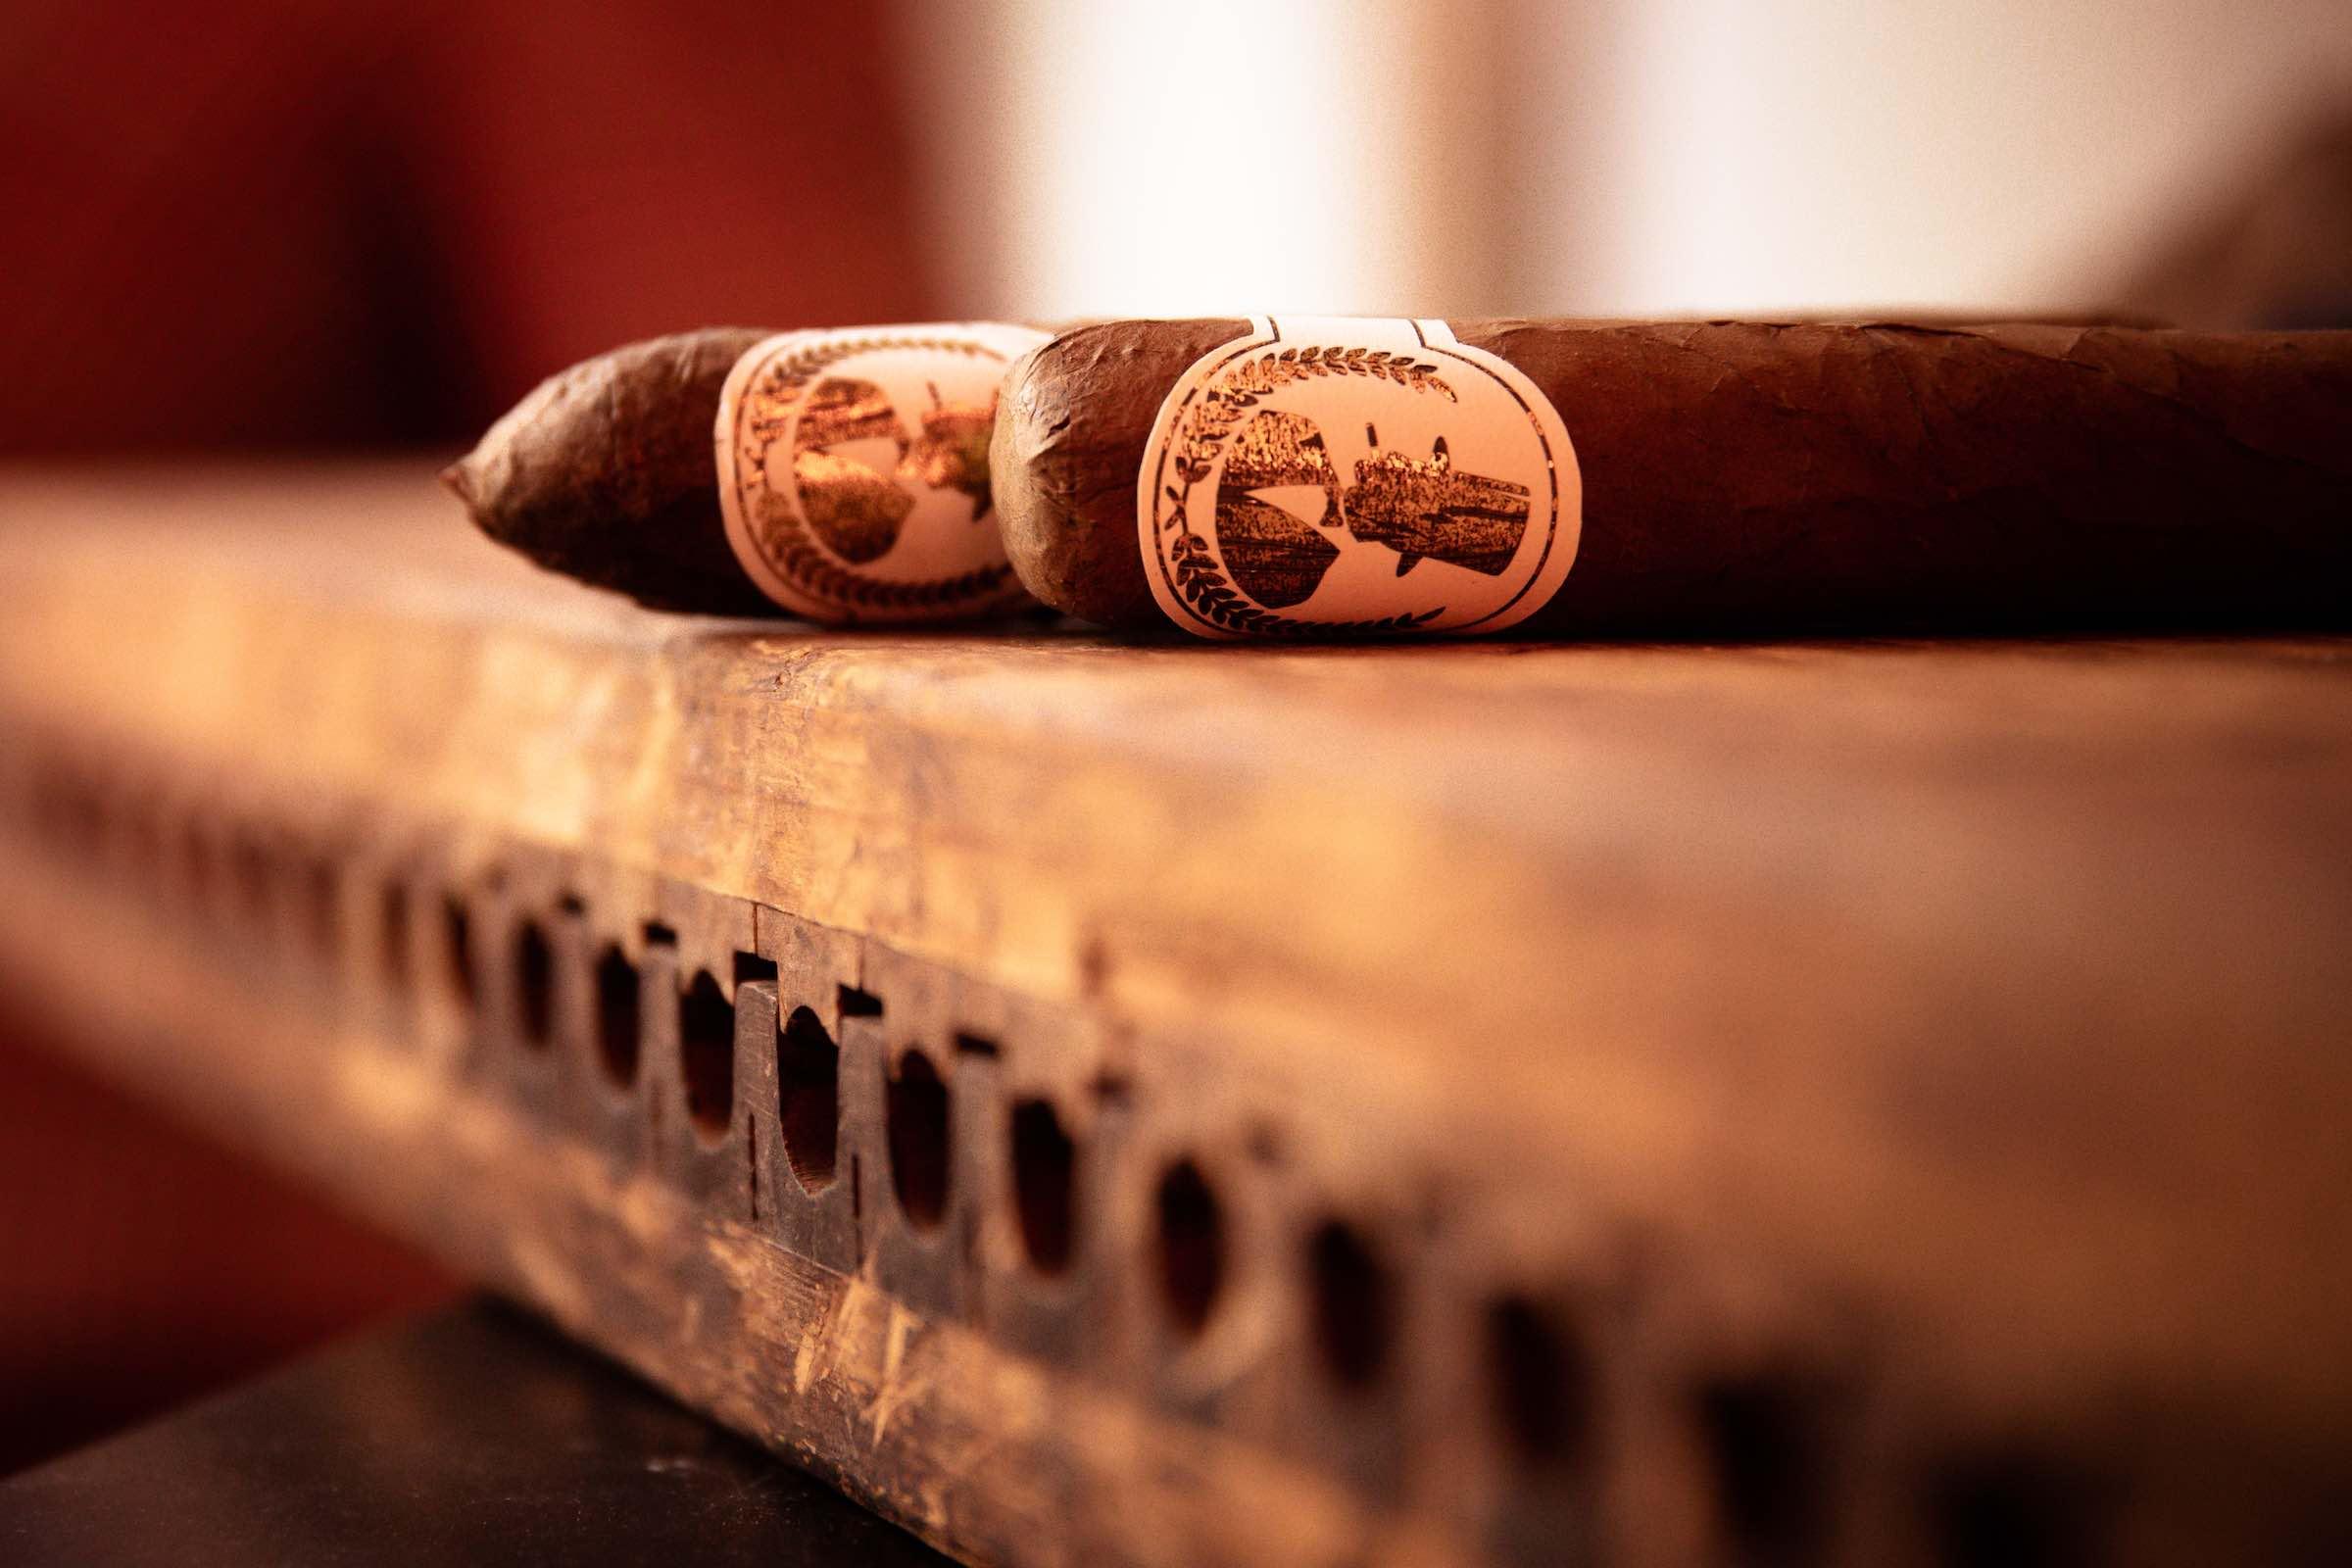 Zigarrendreher | Zigarrenroller | Zigarrenrollerin | Trocadero | Kaufen | Buchen | Mieten | Handgemacht | Zigarren | Zigarrenkleber | Churchill | Robusto | Corona | Robusto | Banderole | Bauchbinde | Tabak | Cuba